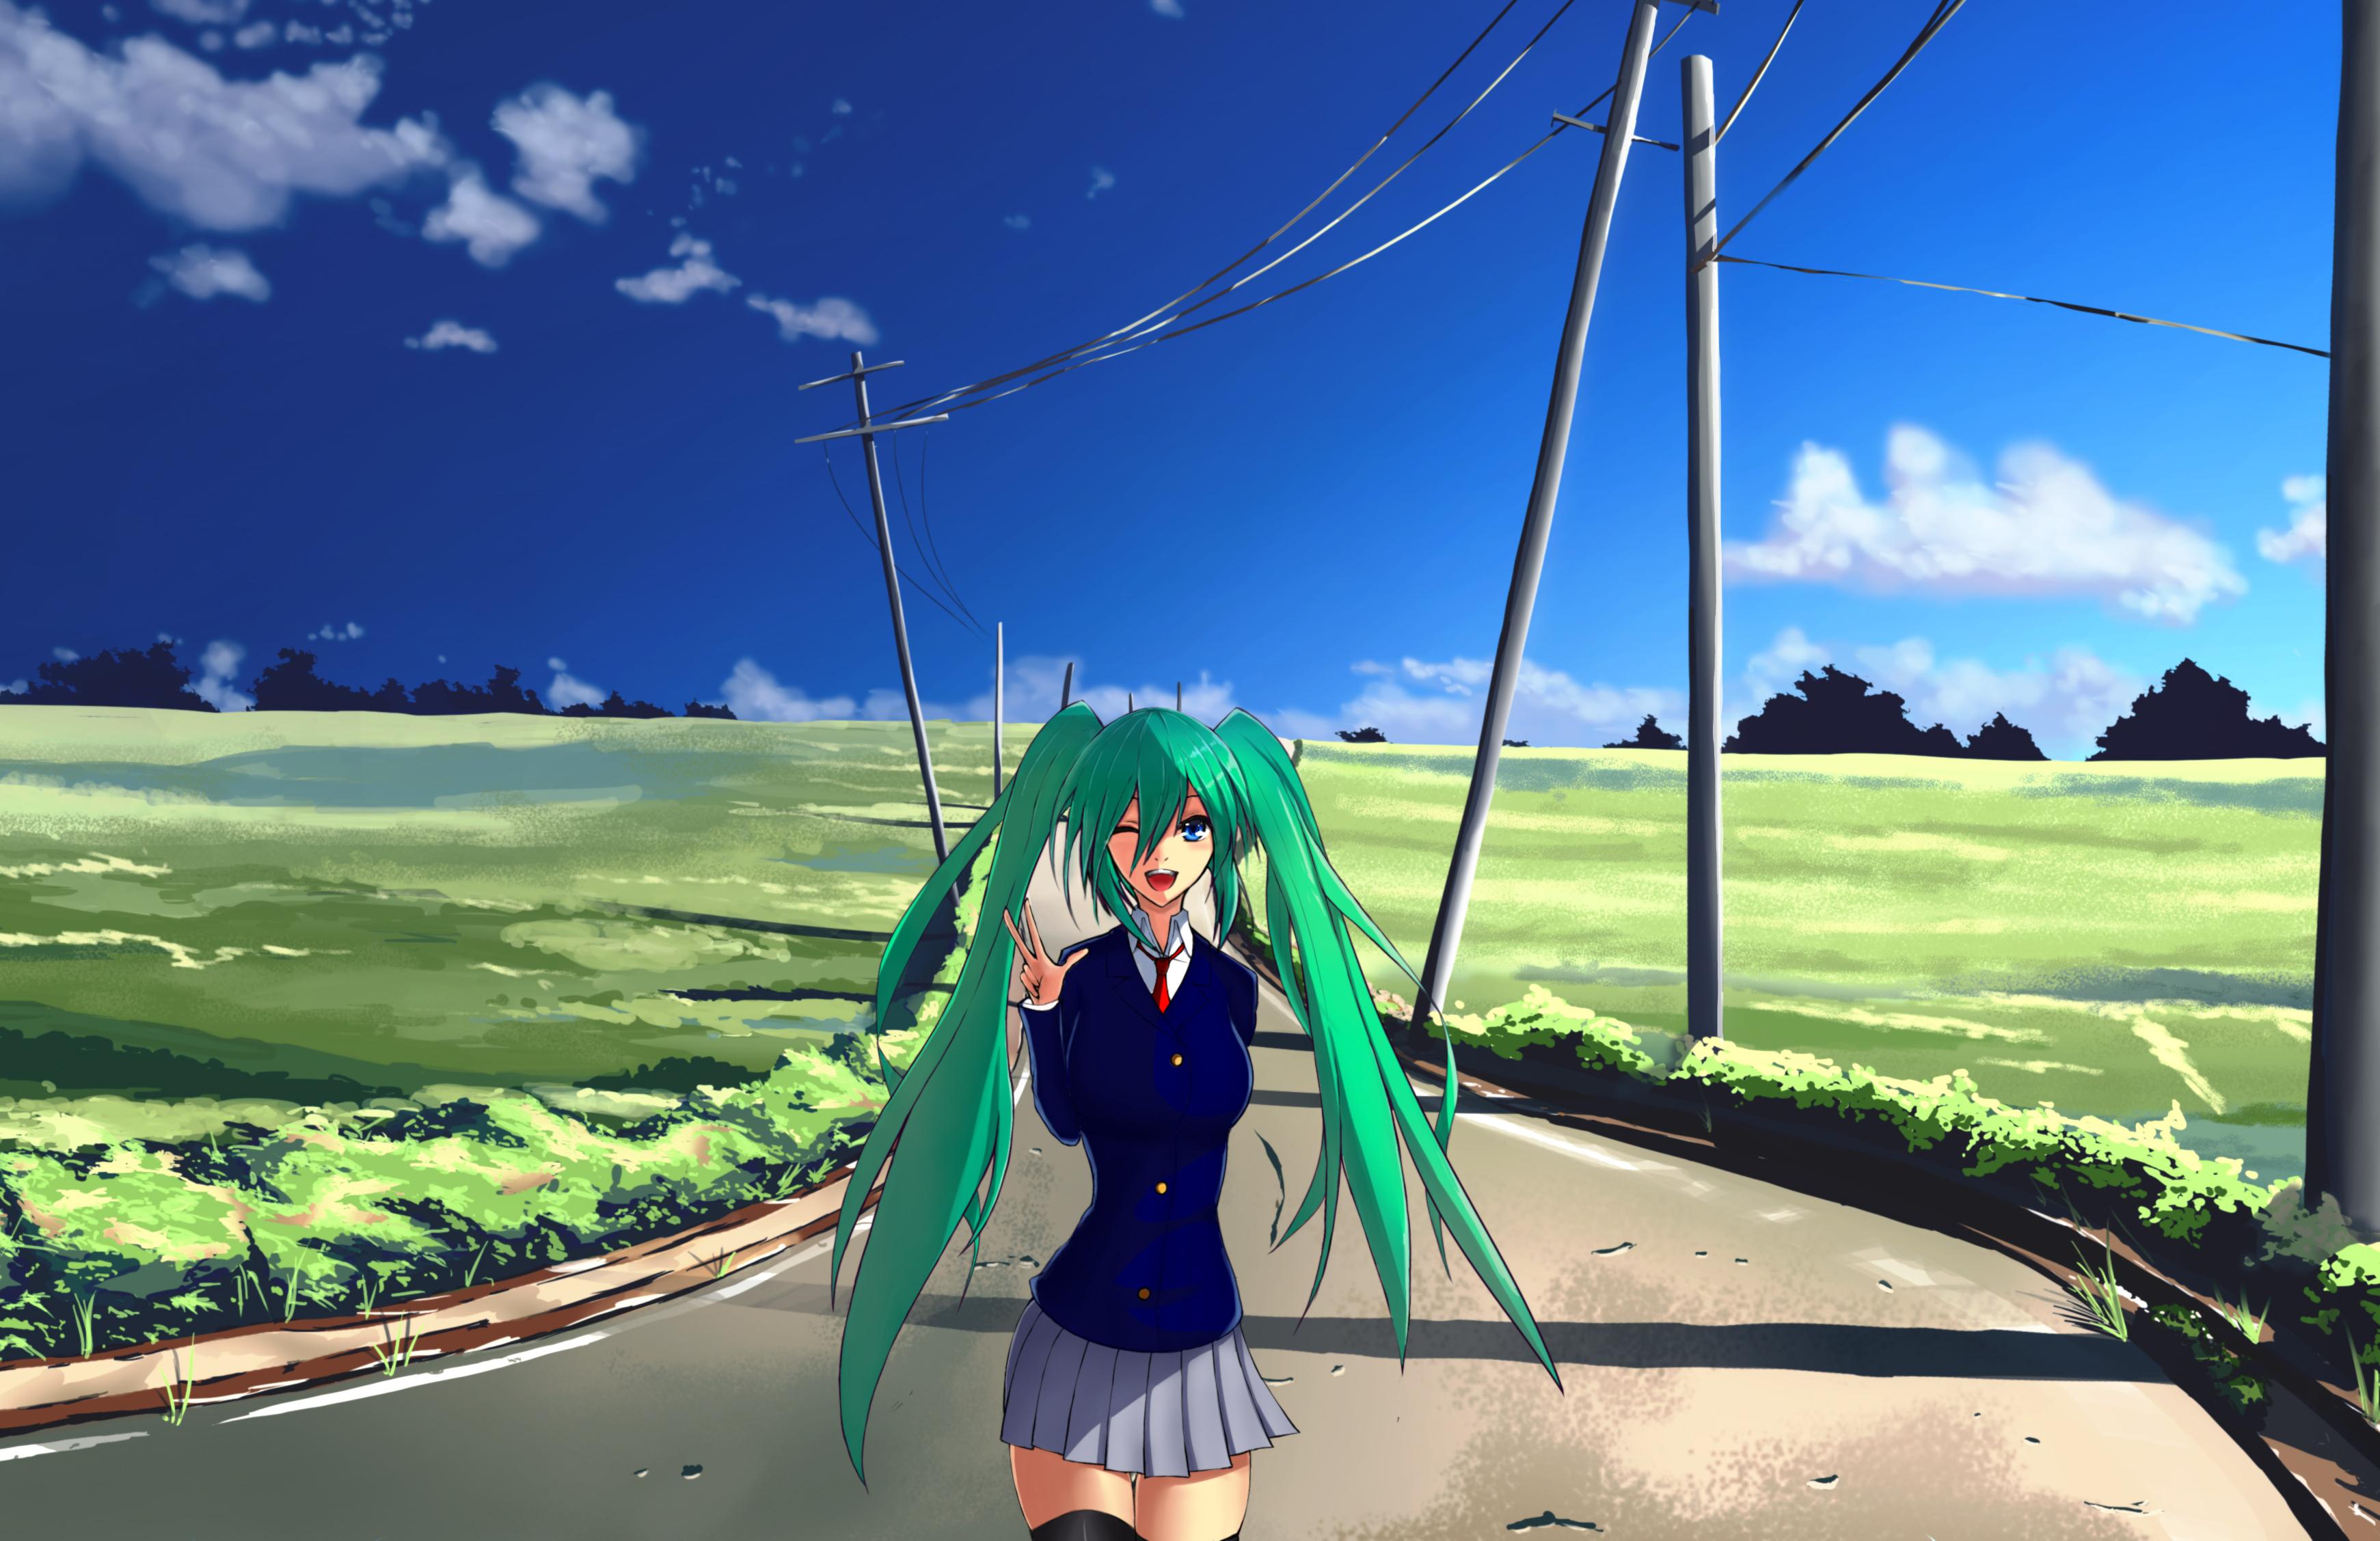 anime landscape hatsune miku - photo #20